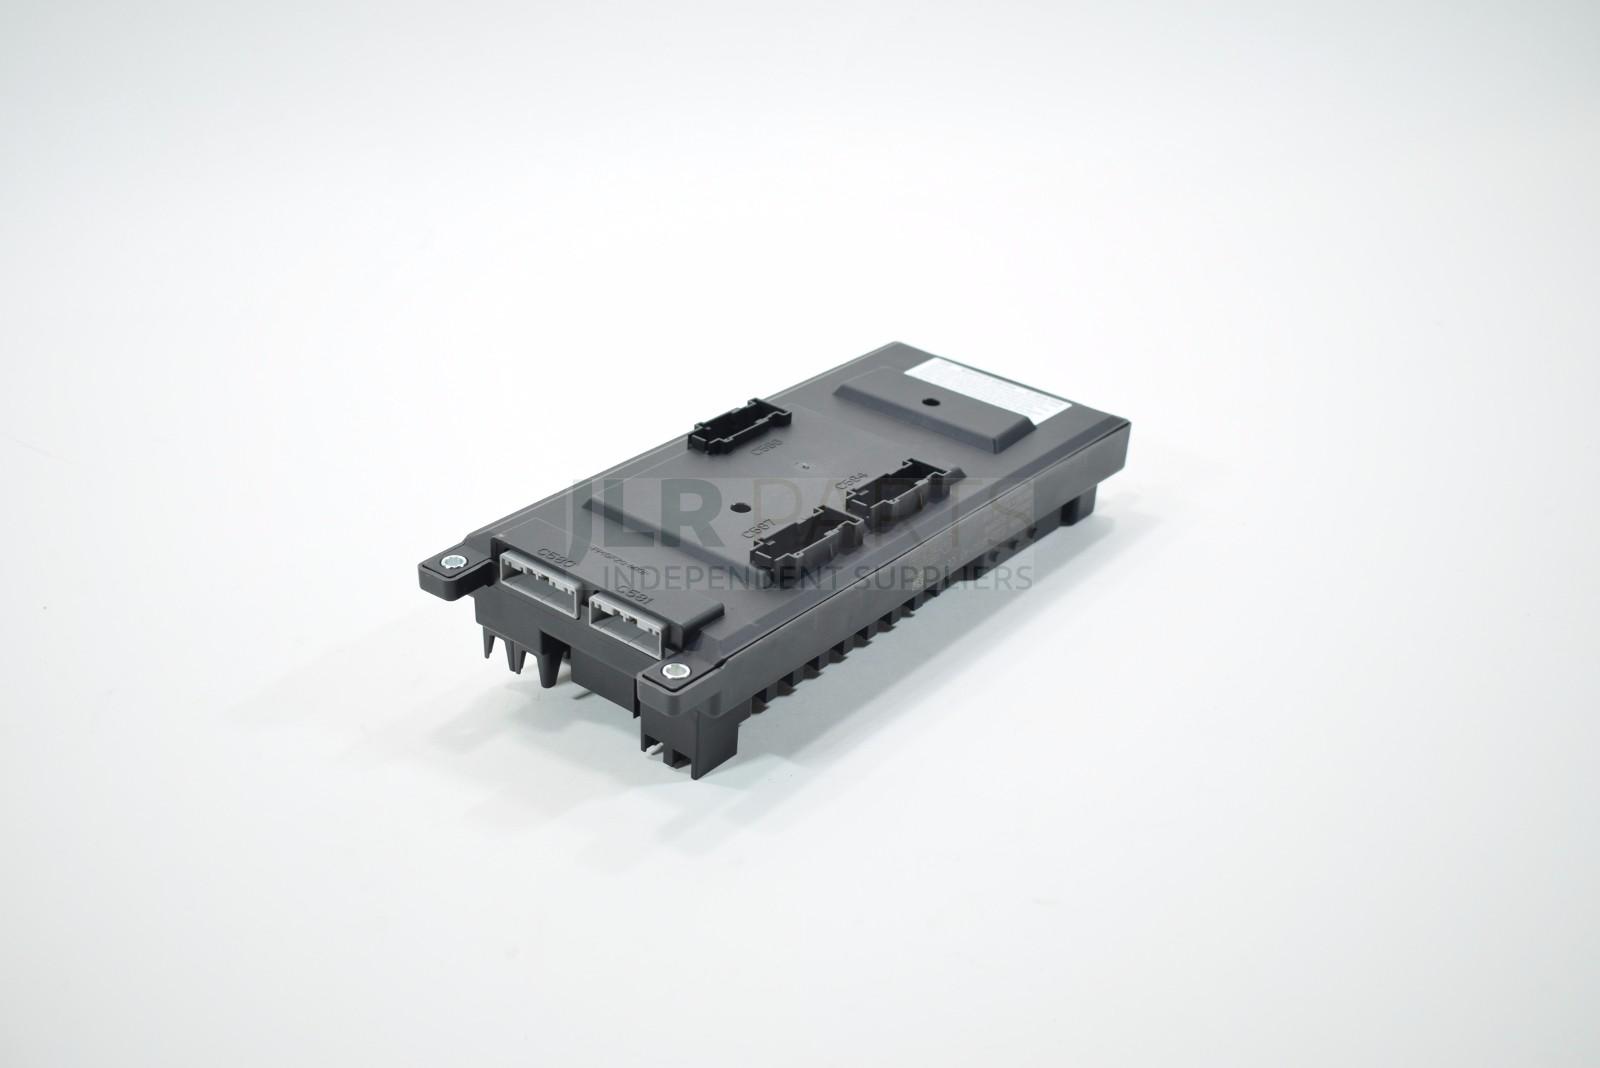 2014 Range Rover Fuse Box Diagram – Lr 90 Wiring Diagram